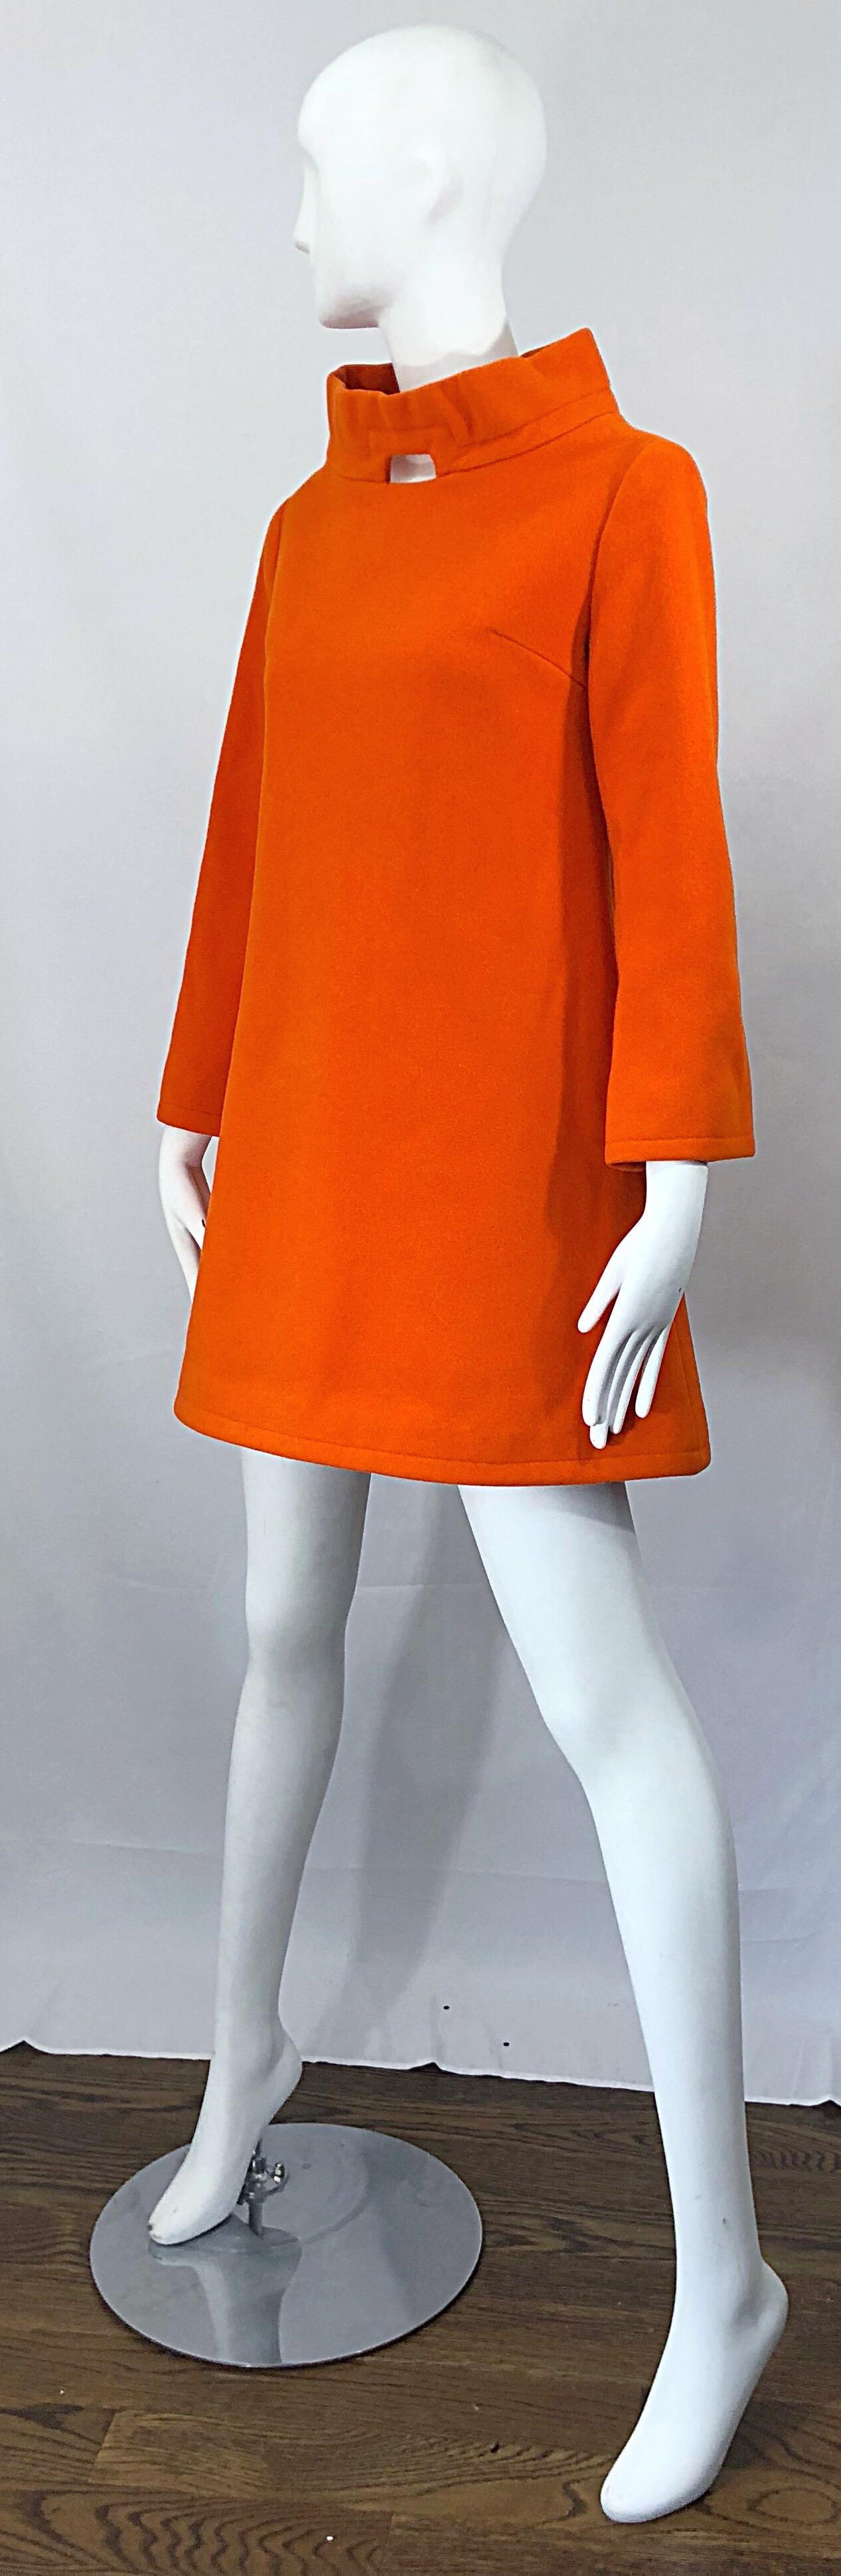 Vintage 60s Brown Orange TAPESTRY CORSET Dolly MOD Wool Dress 12 M 1960s Modette